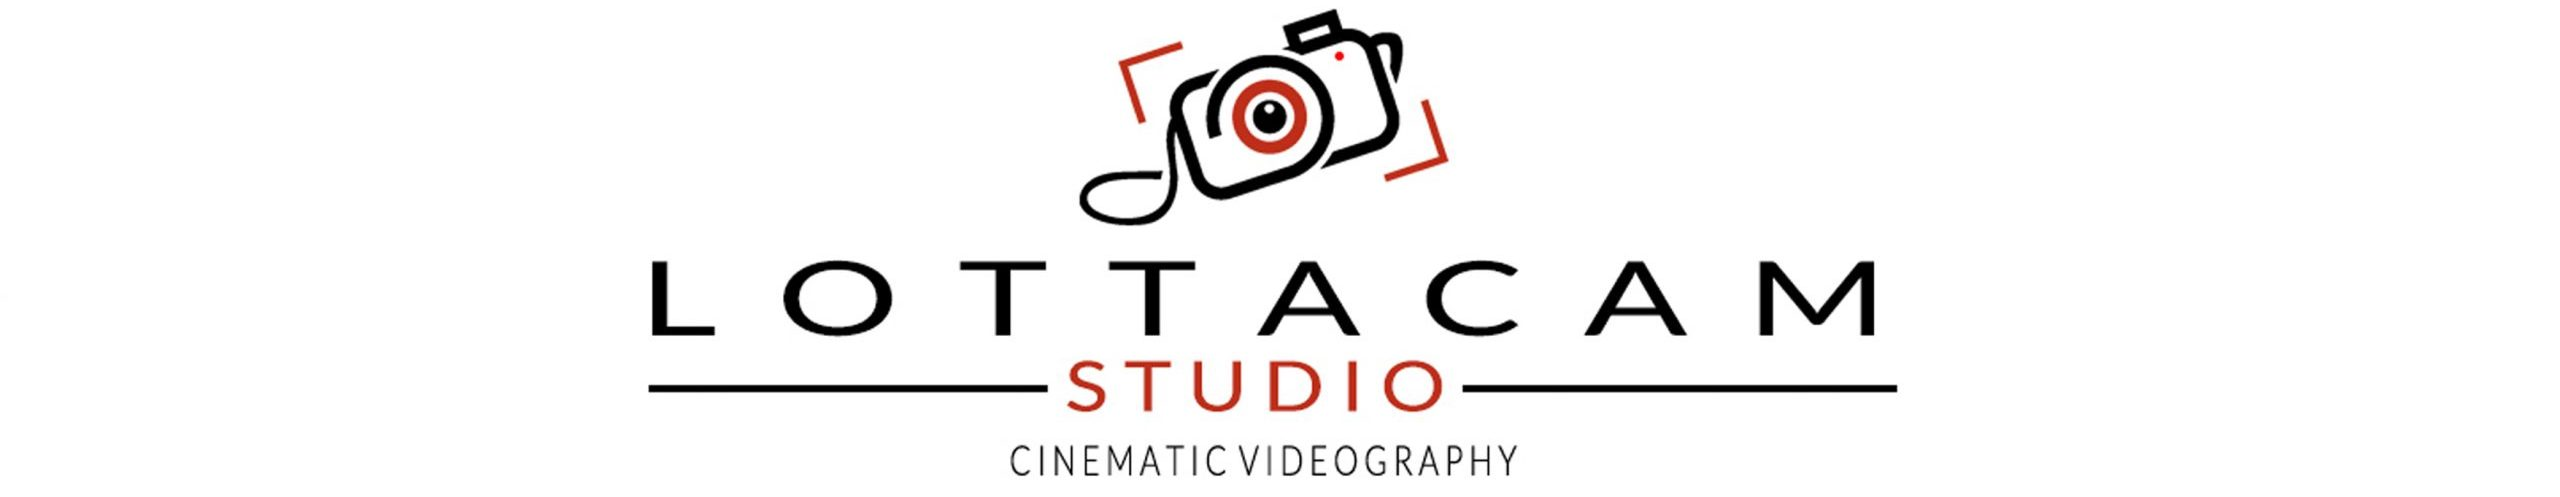 Lottacam Studio